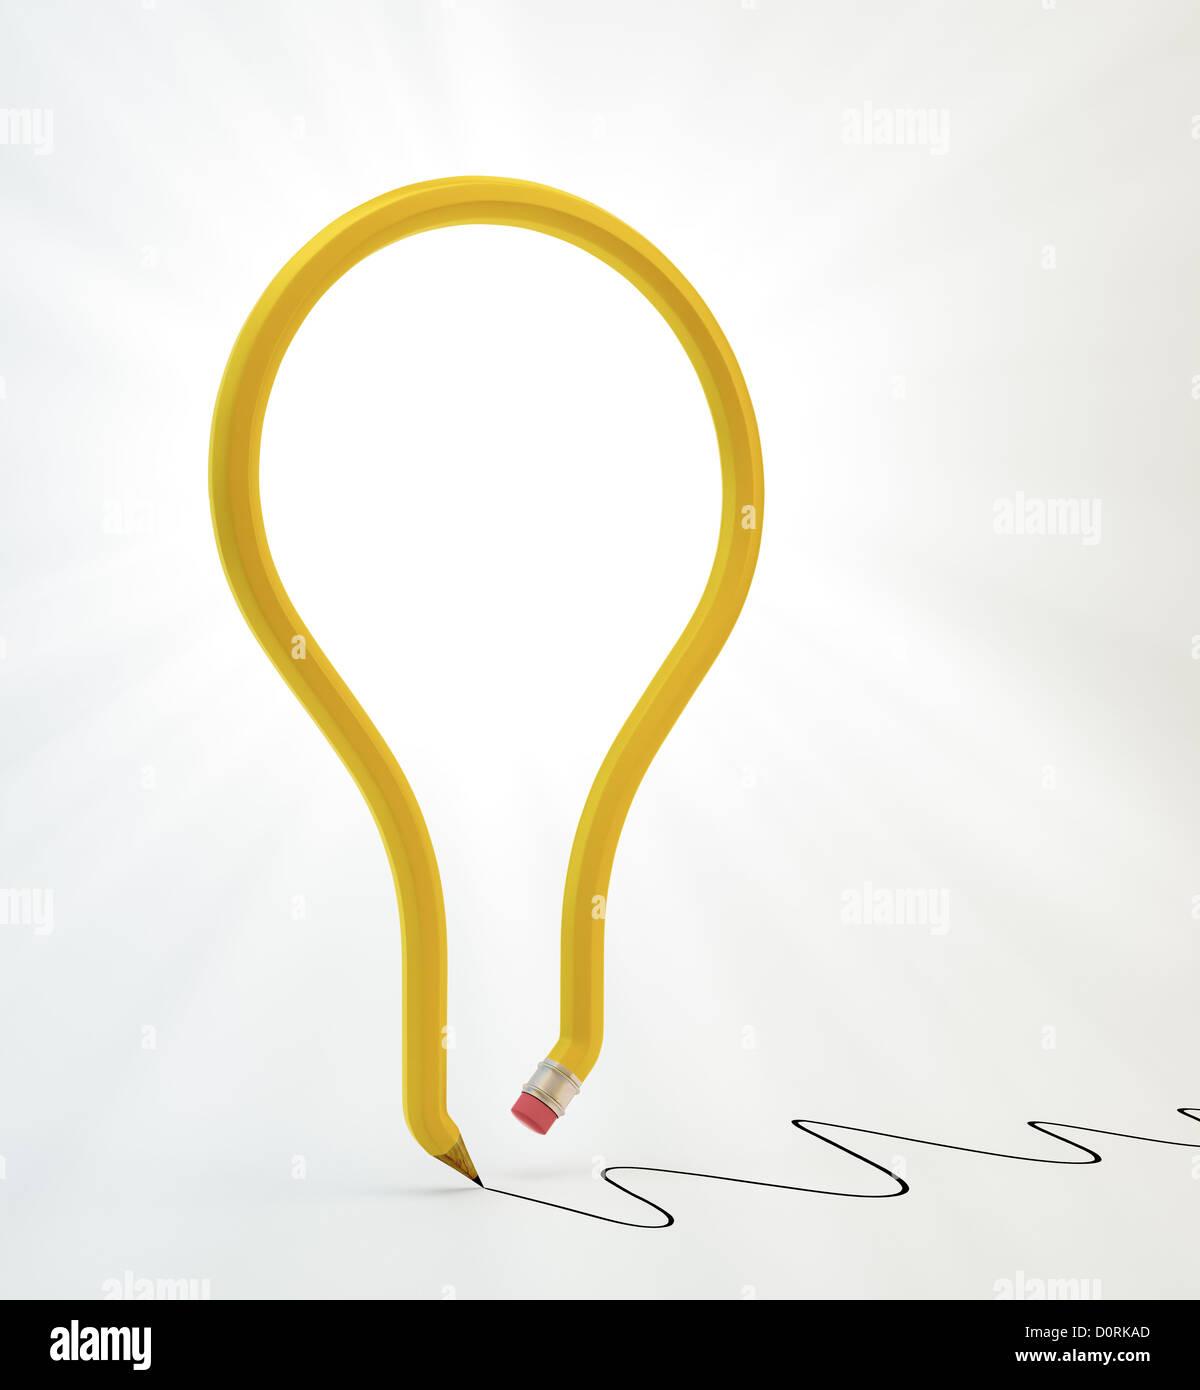 light bulb pencil Stock Photo